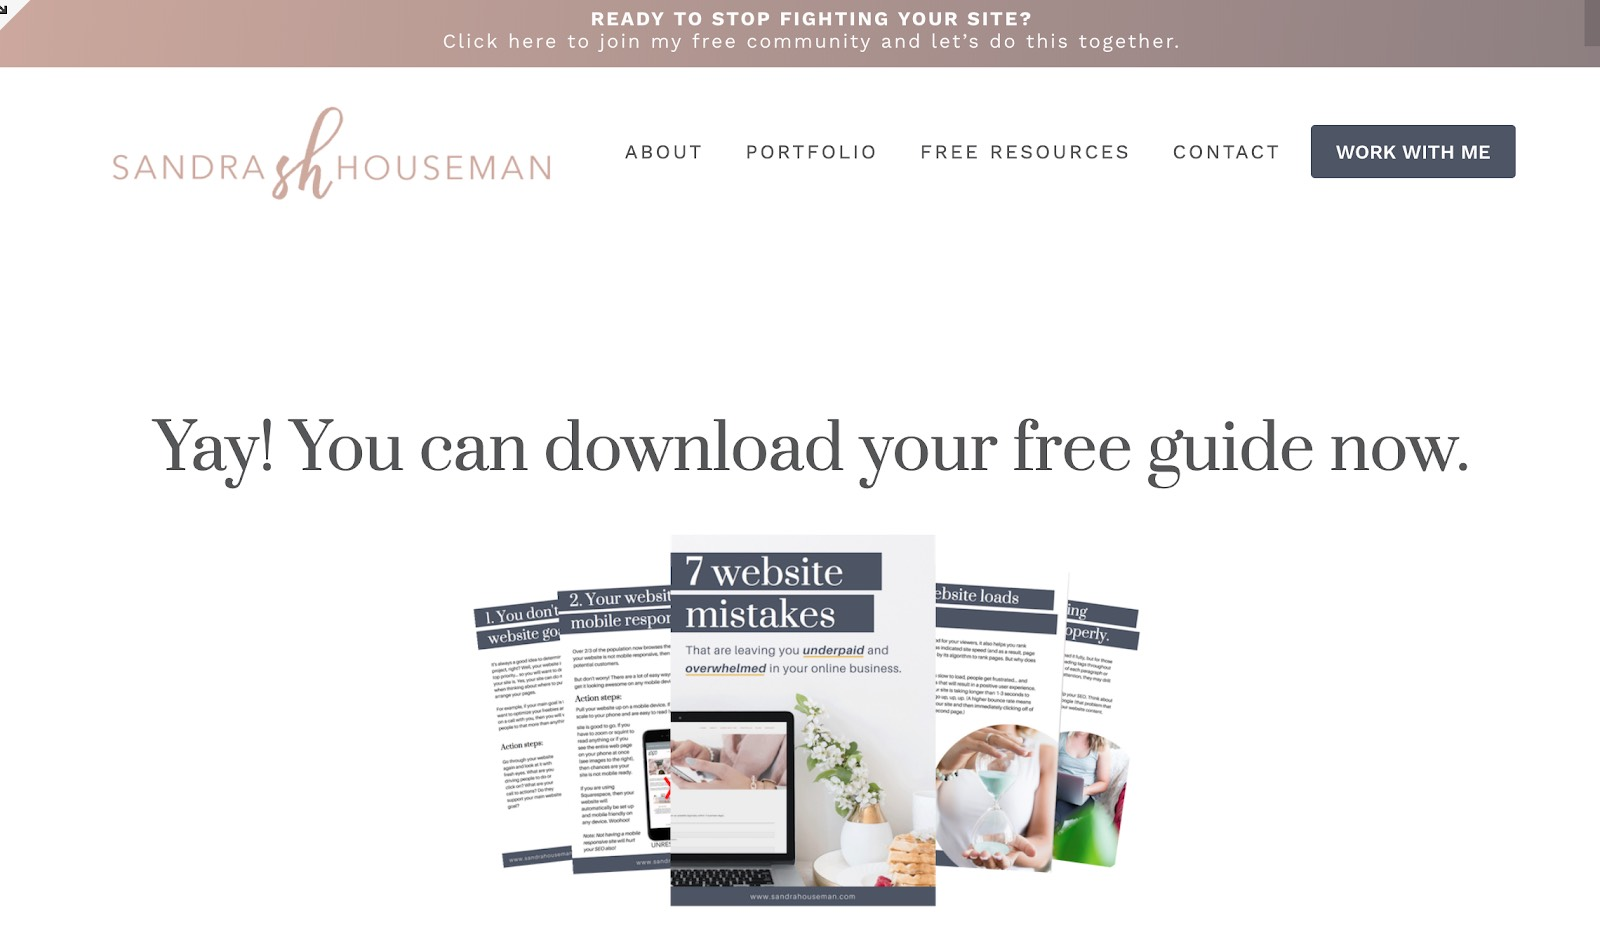 sandra houseman how to grow your email list